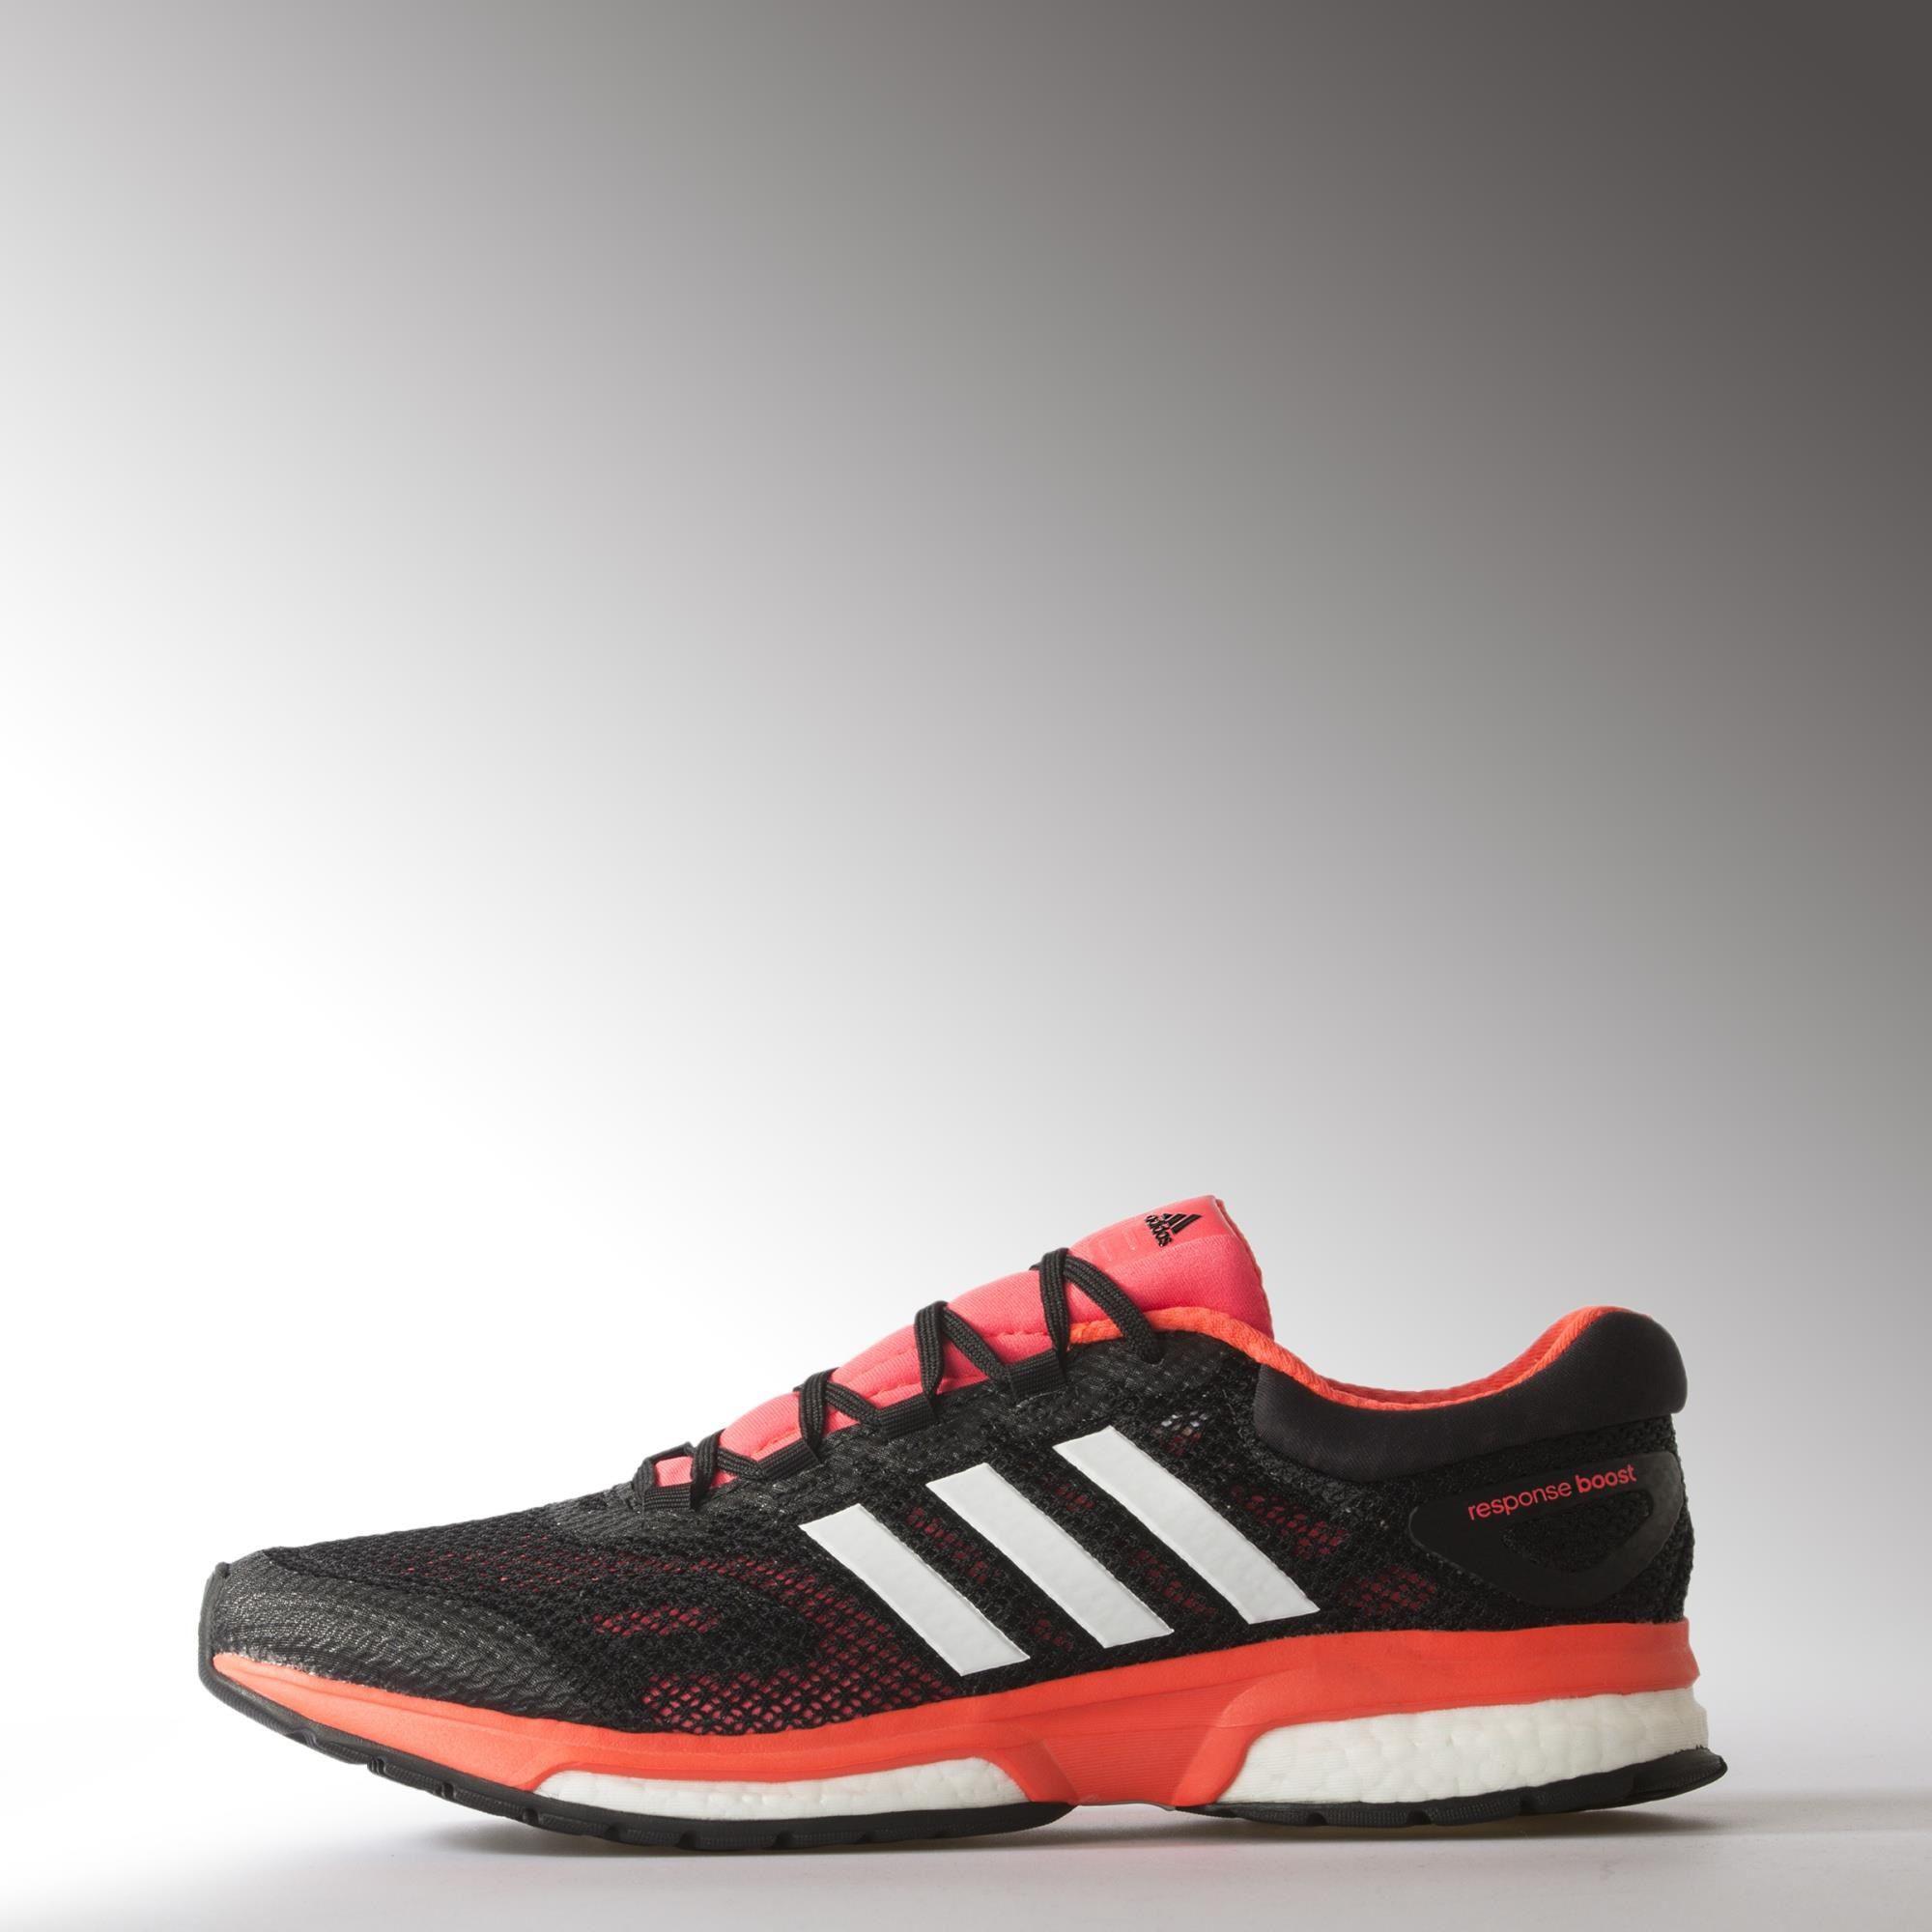 Adidas Mens Response Boost Running Shoes - Solar Red - Tennisnuts.com d00e68930